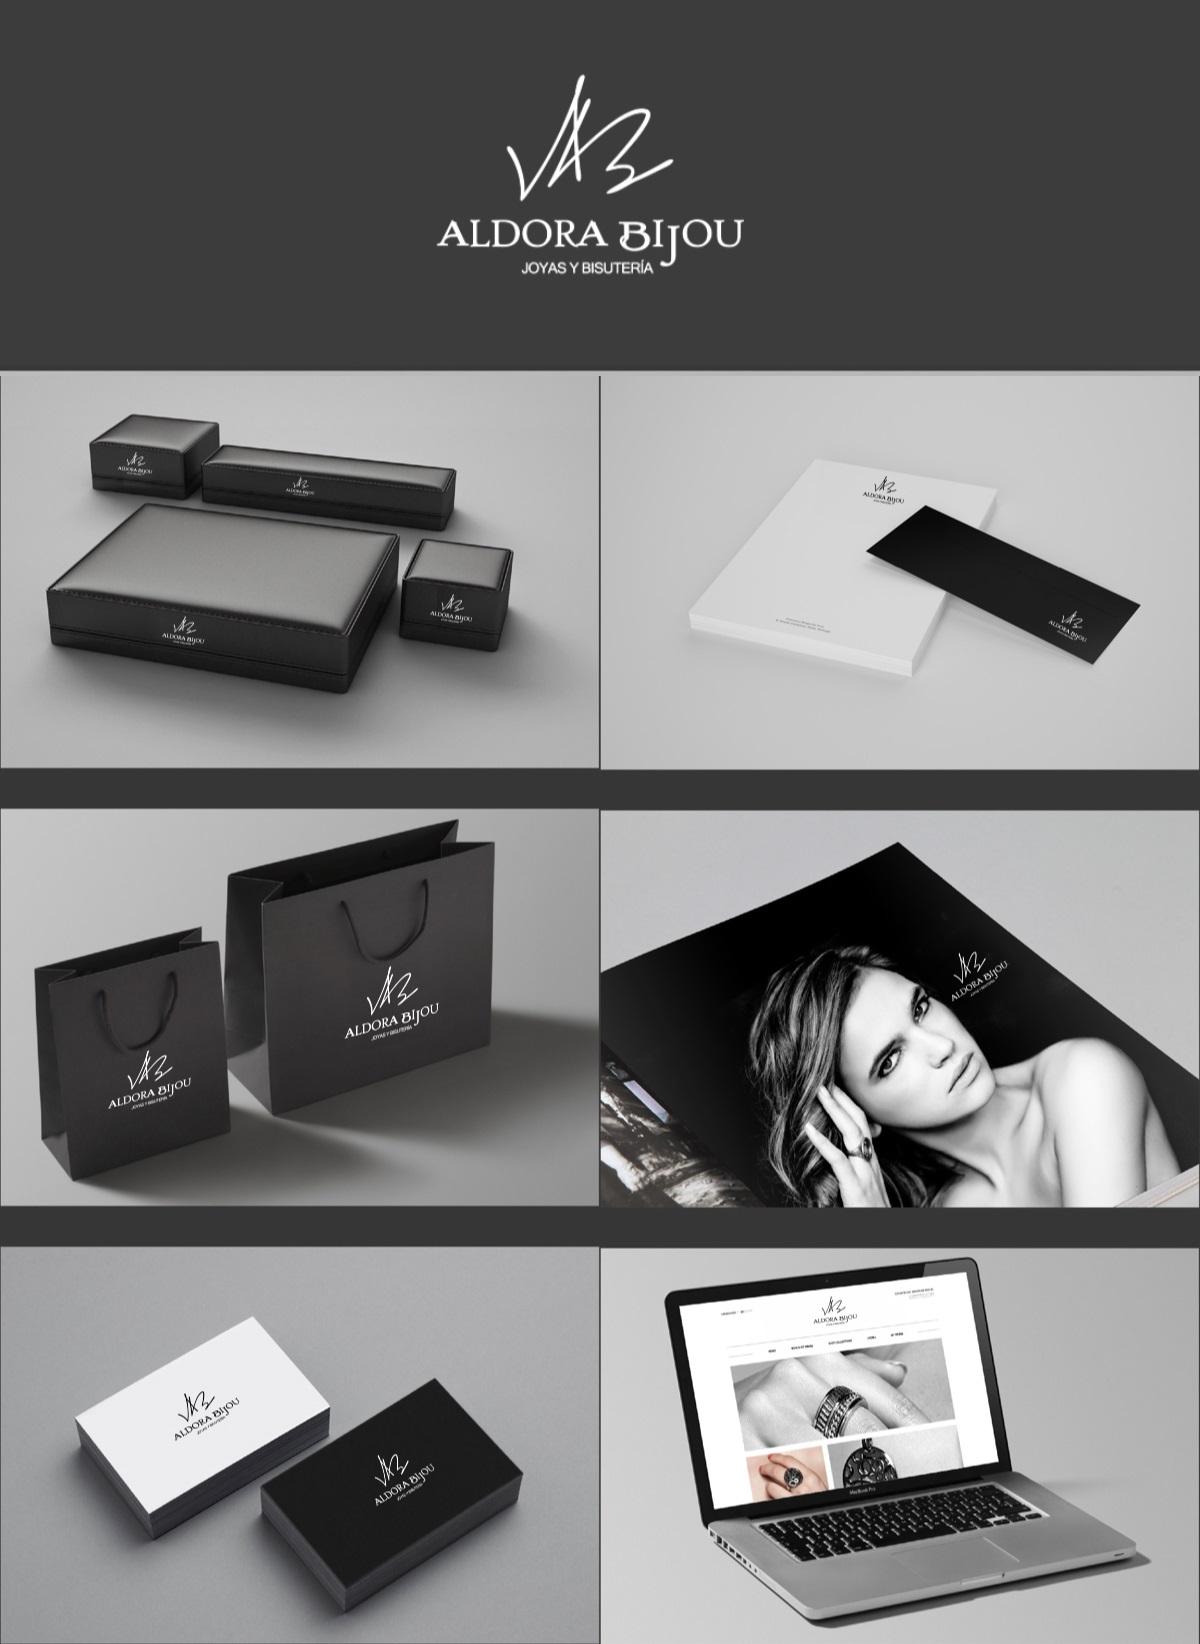 https://www.perfectpixel.es/wp-content/uploads/2015/05/Aldora-Bijou-Joyas-by-PerfectPixel-Publicidad.jpg